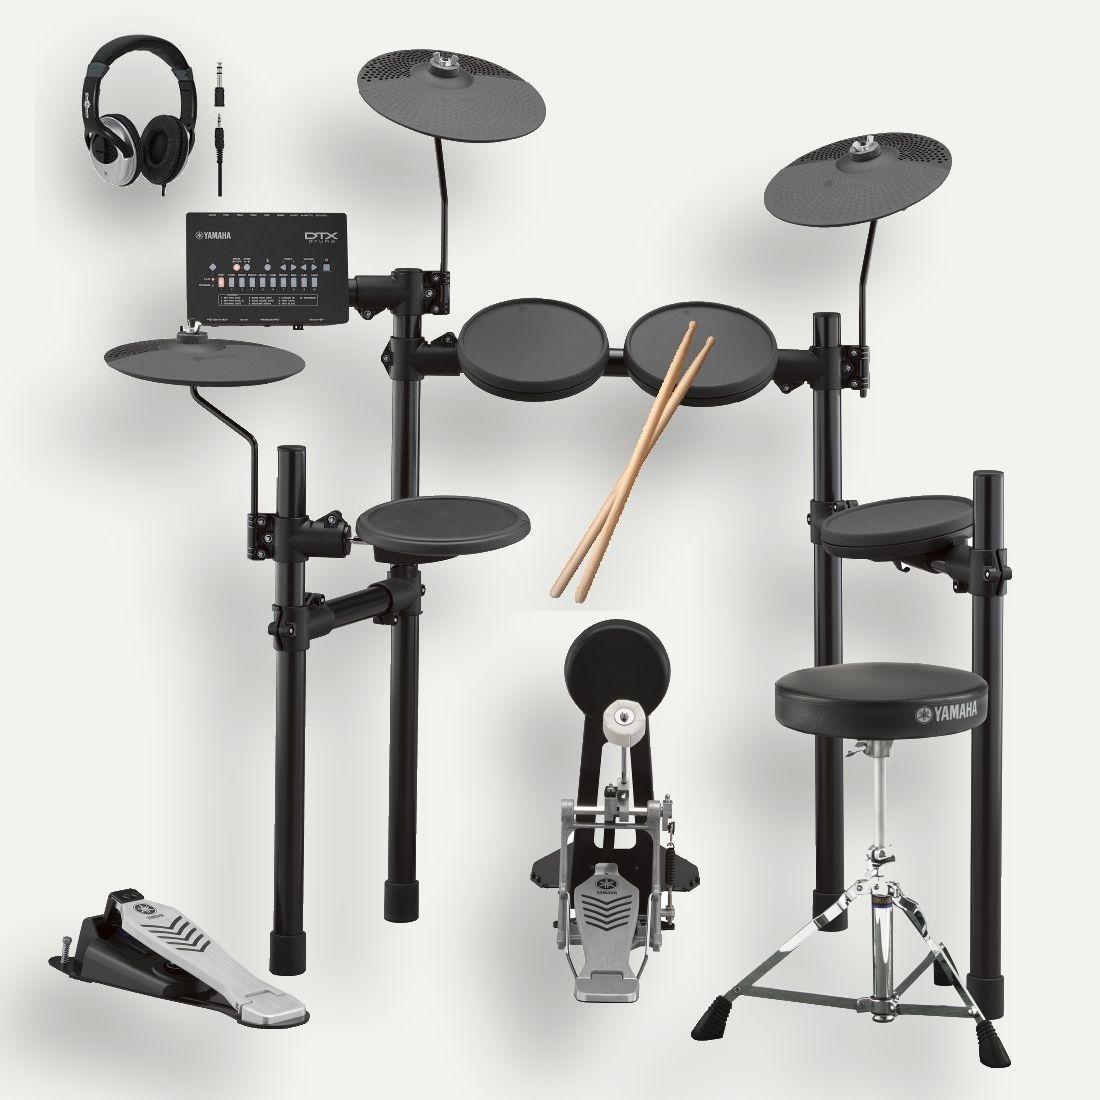 YAMAHA ヤマハ 電子ドラム DTX452KS ドラム椅子 スティック ヘッドホン 付